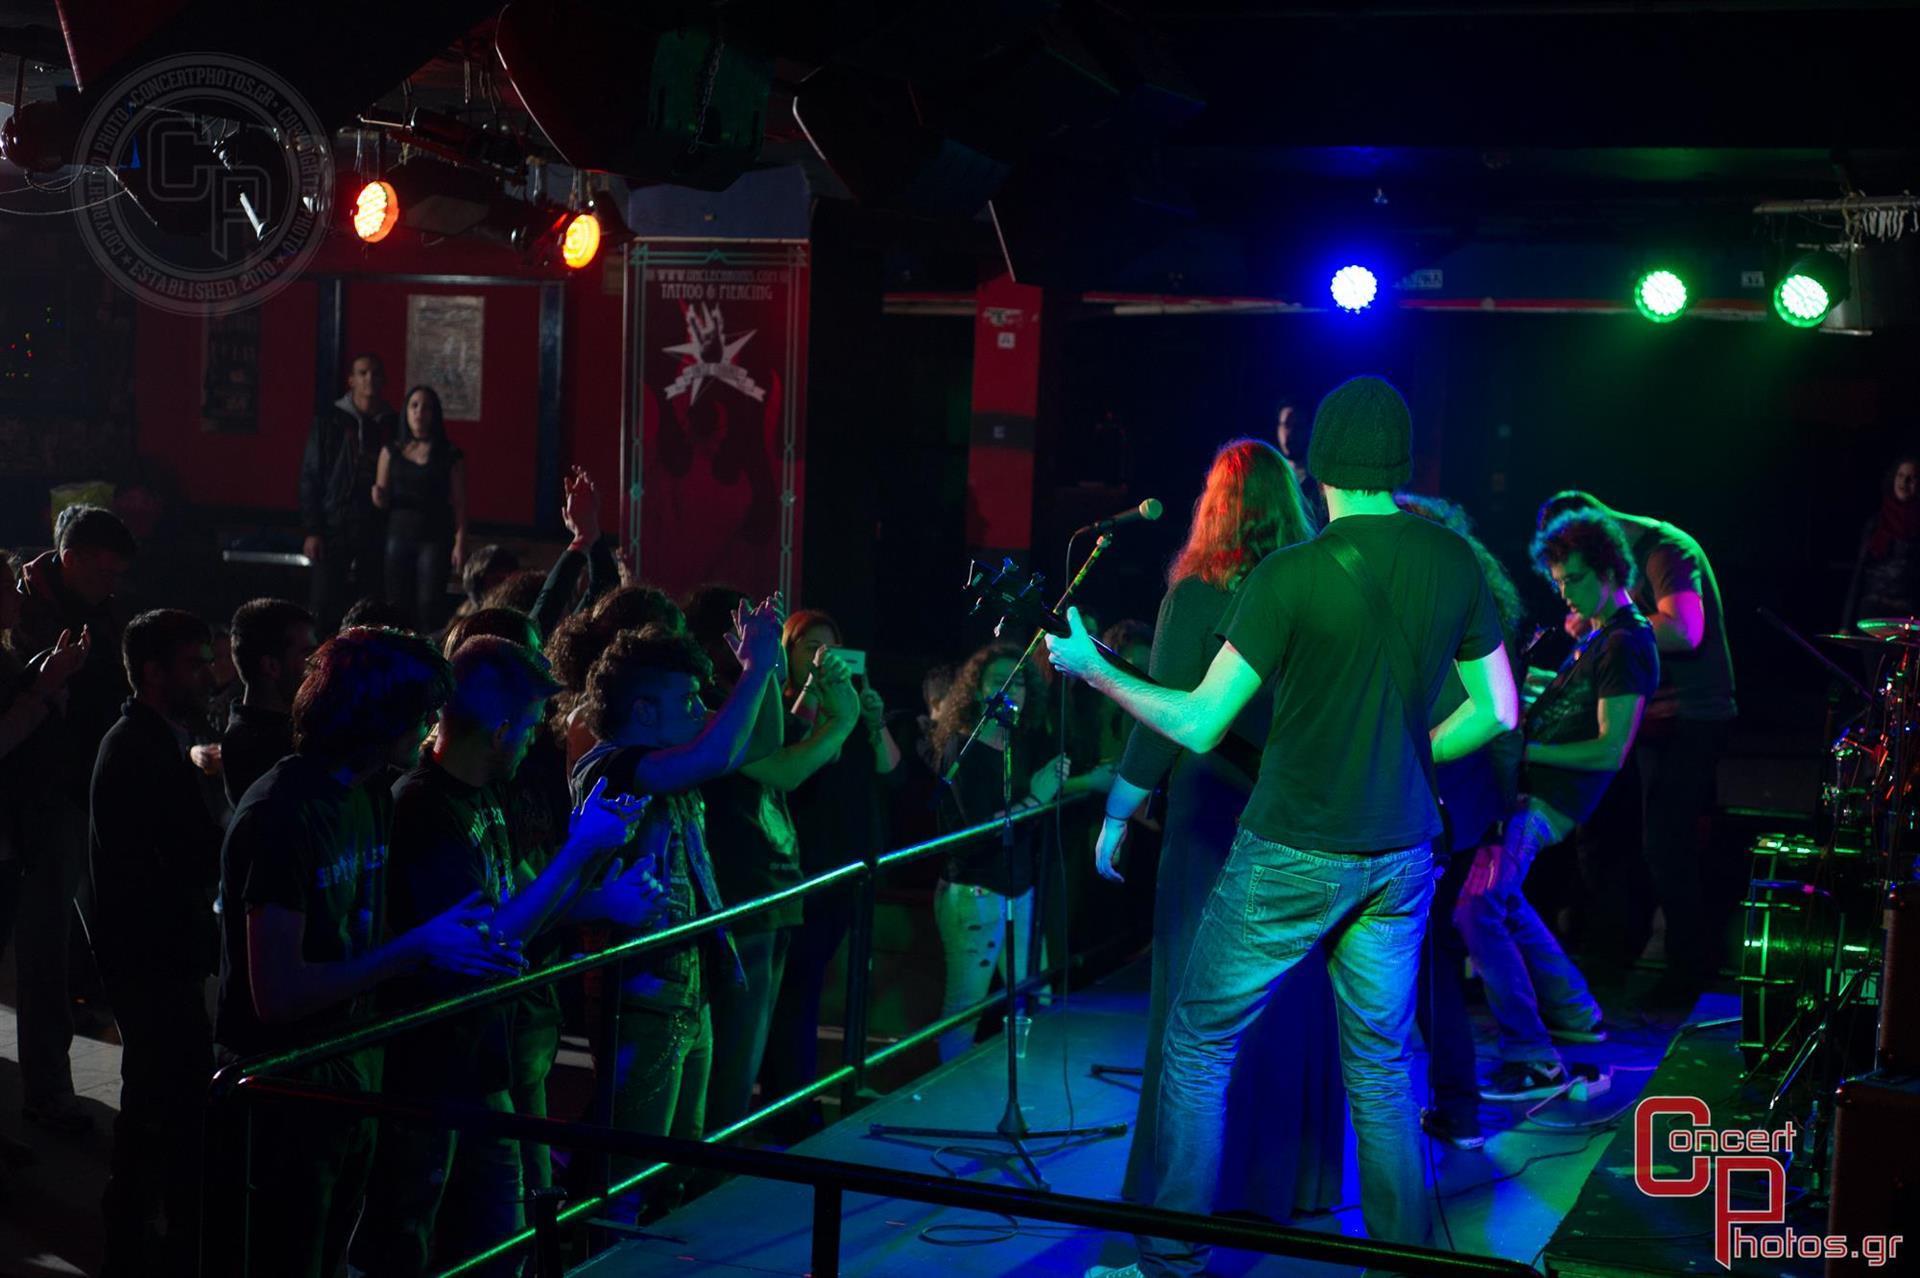 Battle Of The Bands Athens - Leg 3- photographer:  - ConcertPhotos - 20150104_2153_59